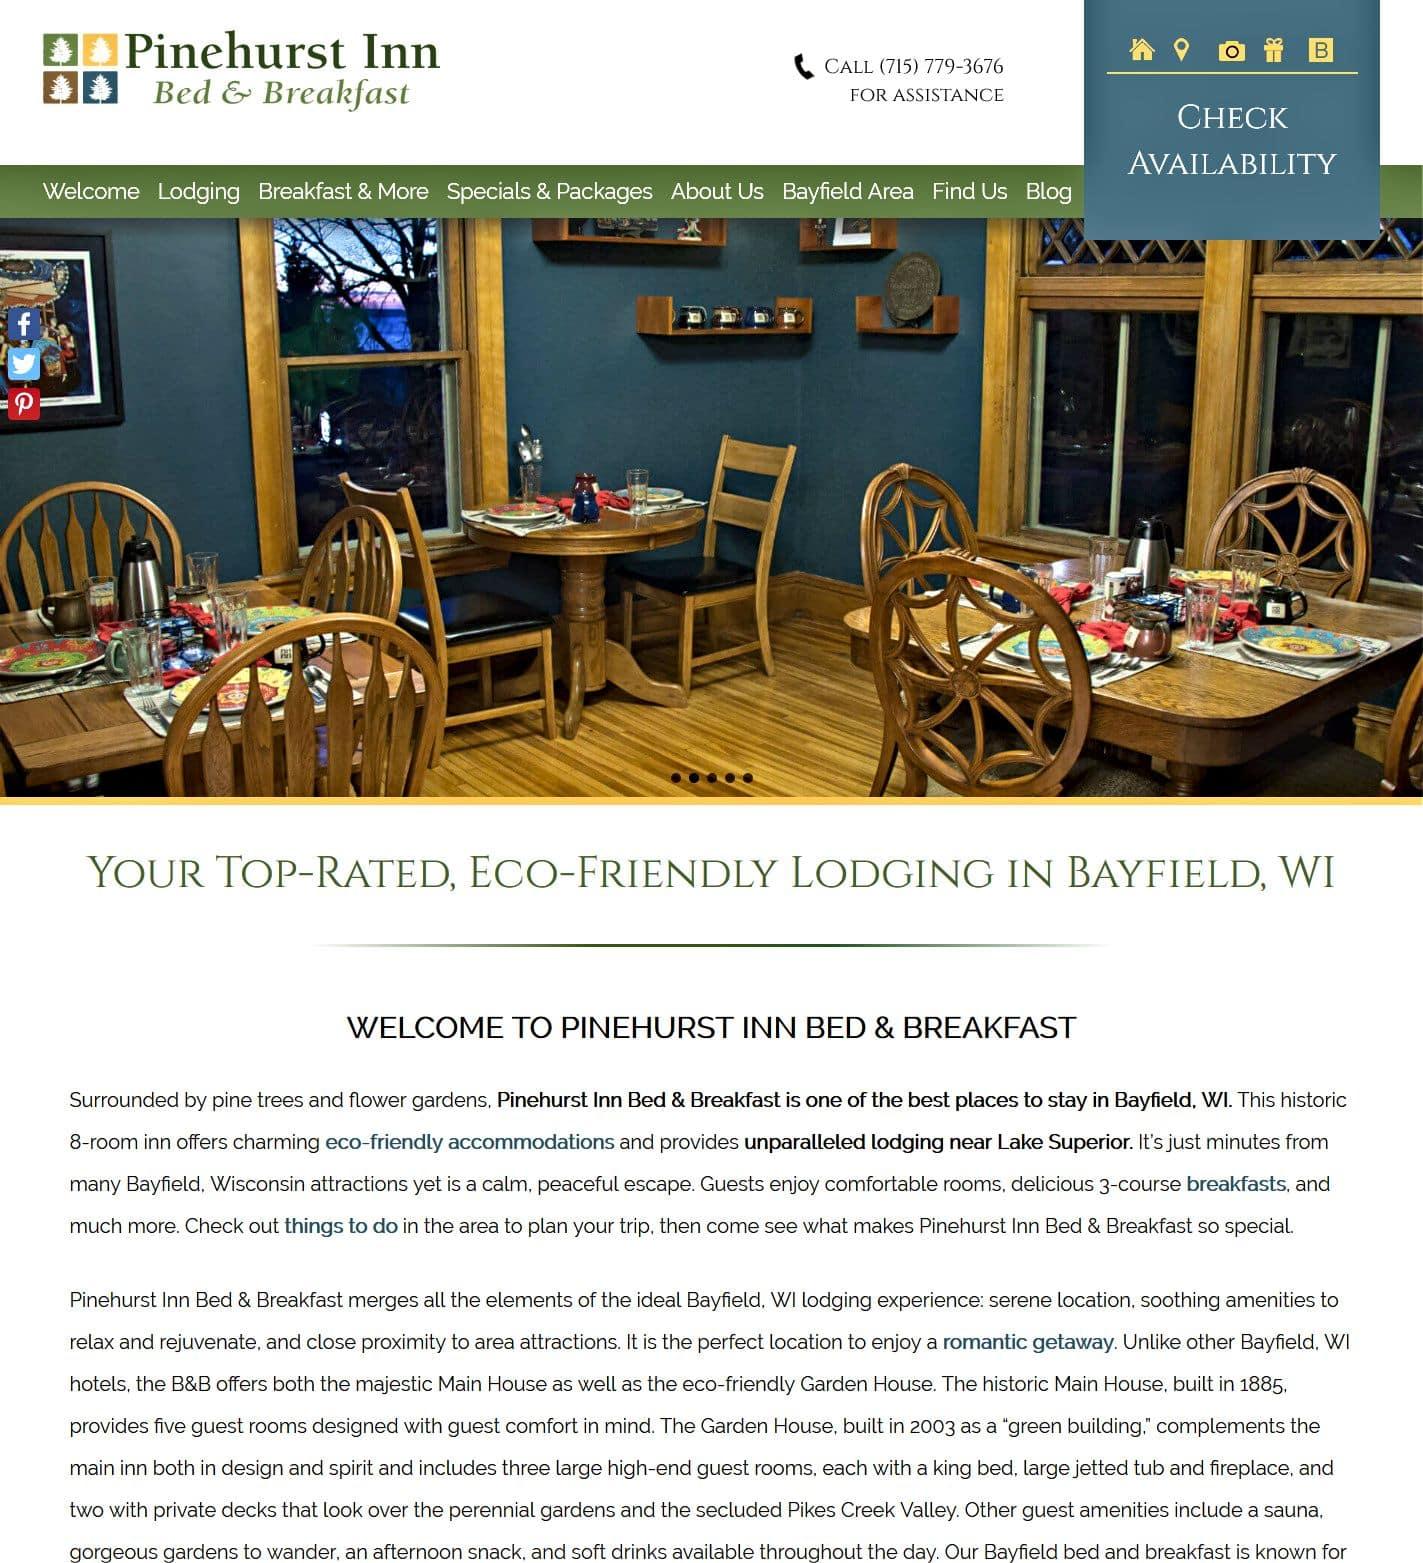 Pinehurst Inn Bed & Breakfats website home page